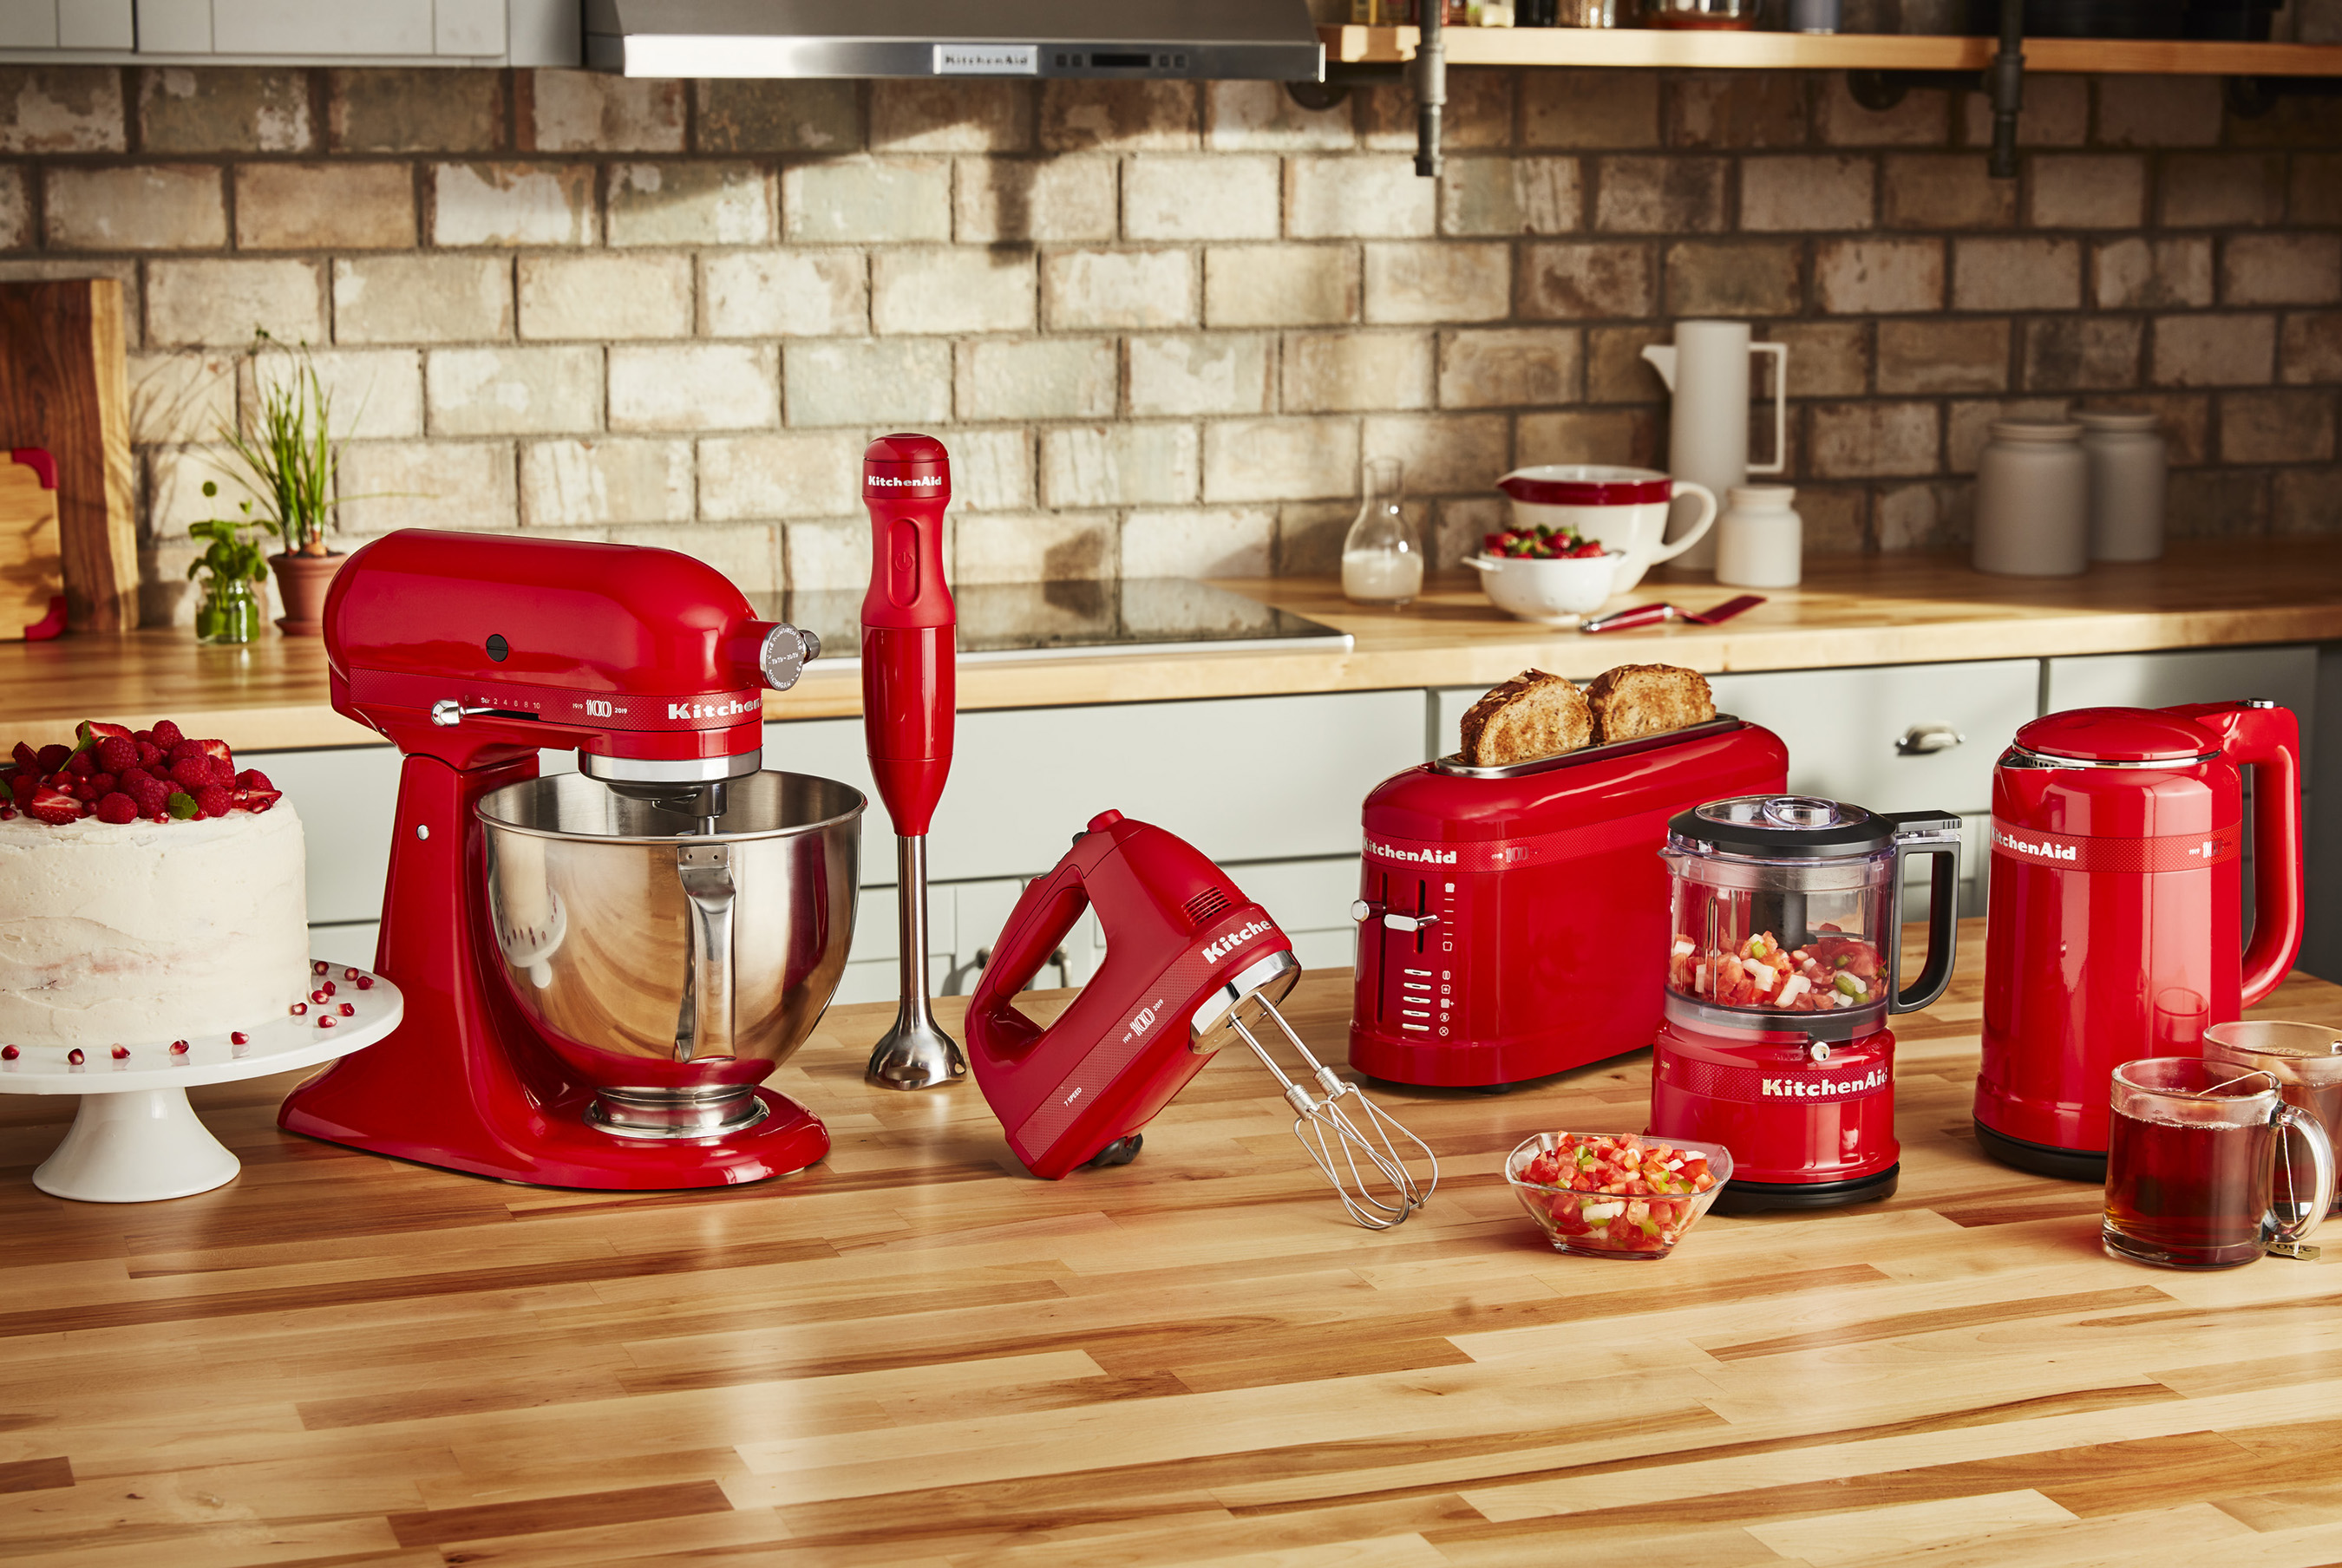 Kitchenaid Celebrates 100 Years Of Making At 2019